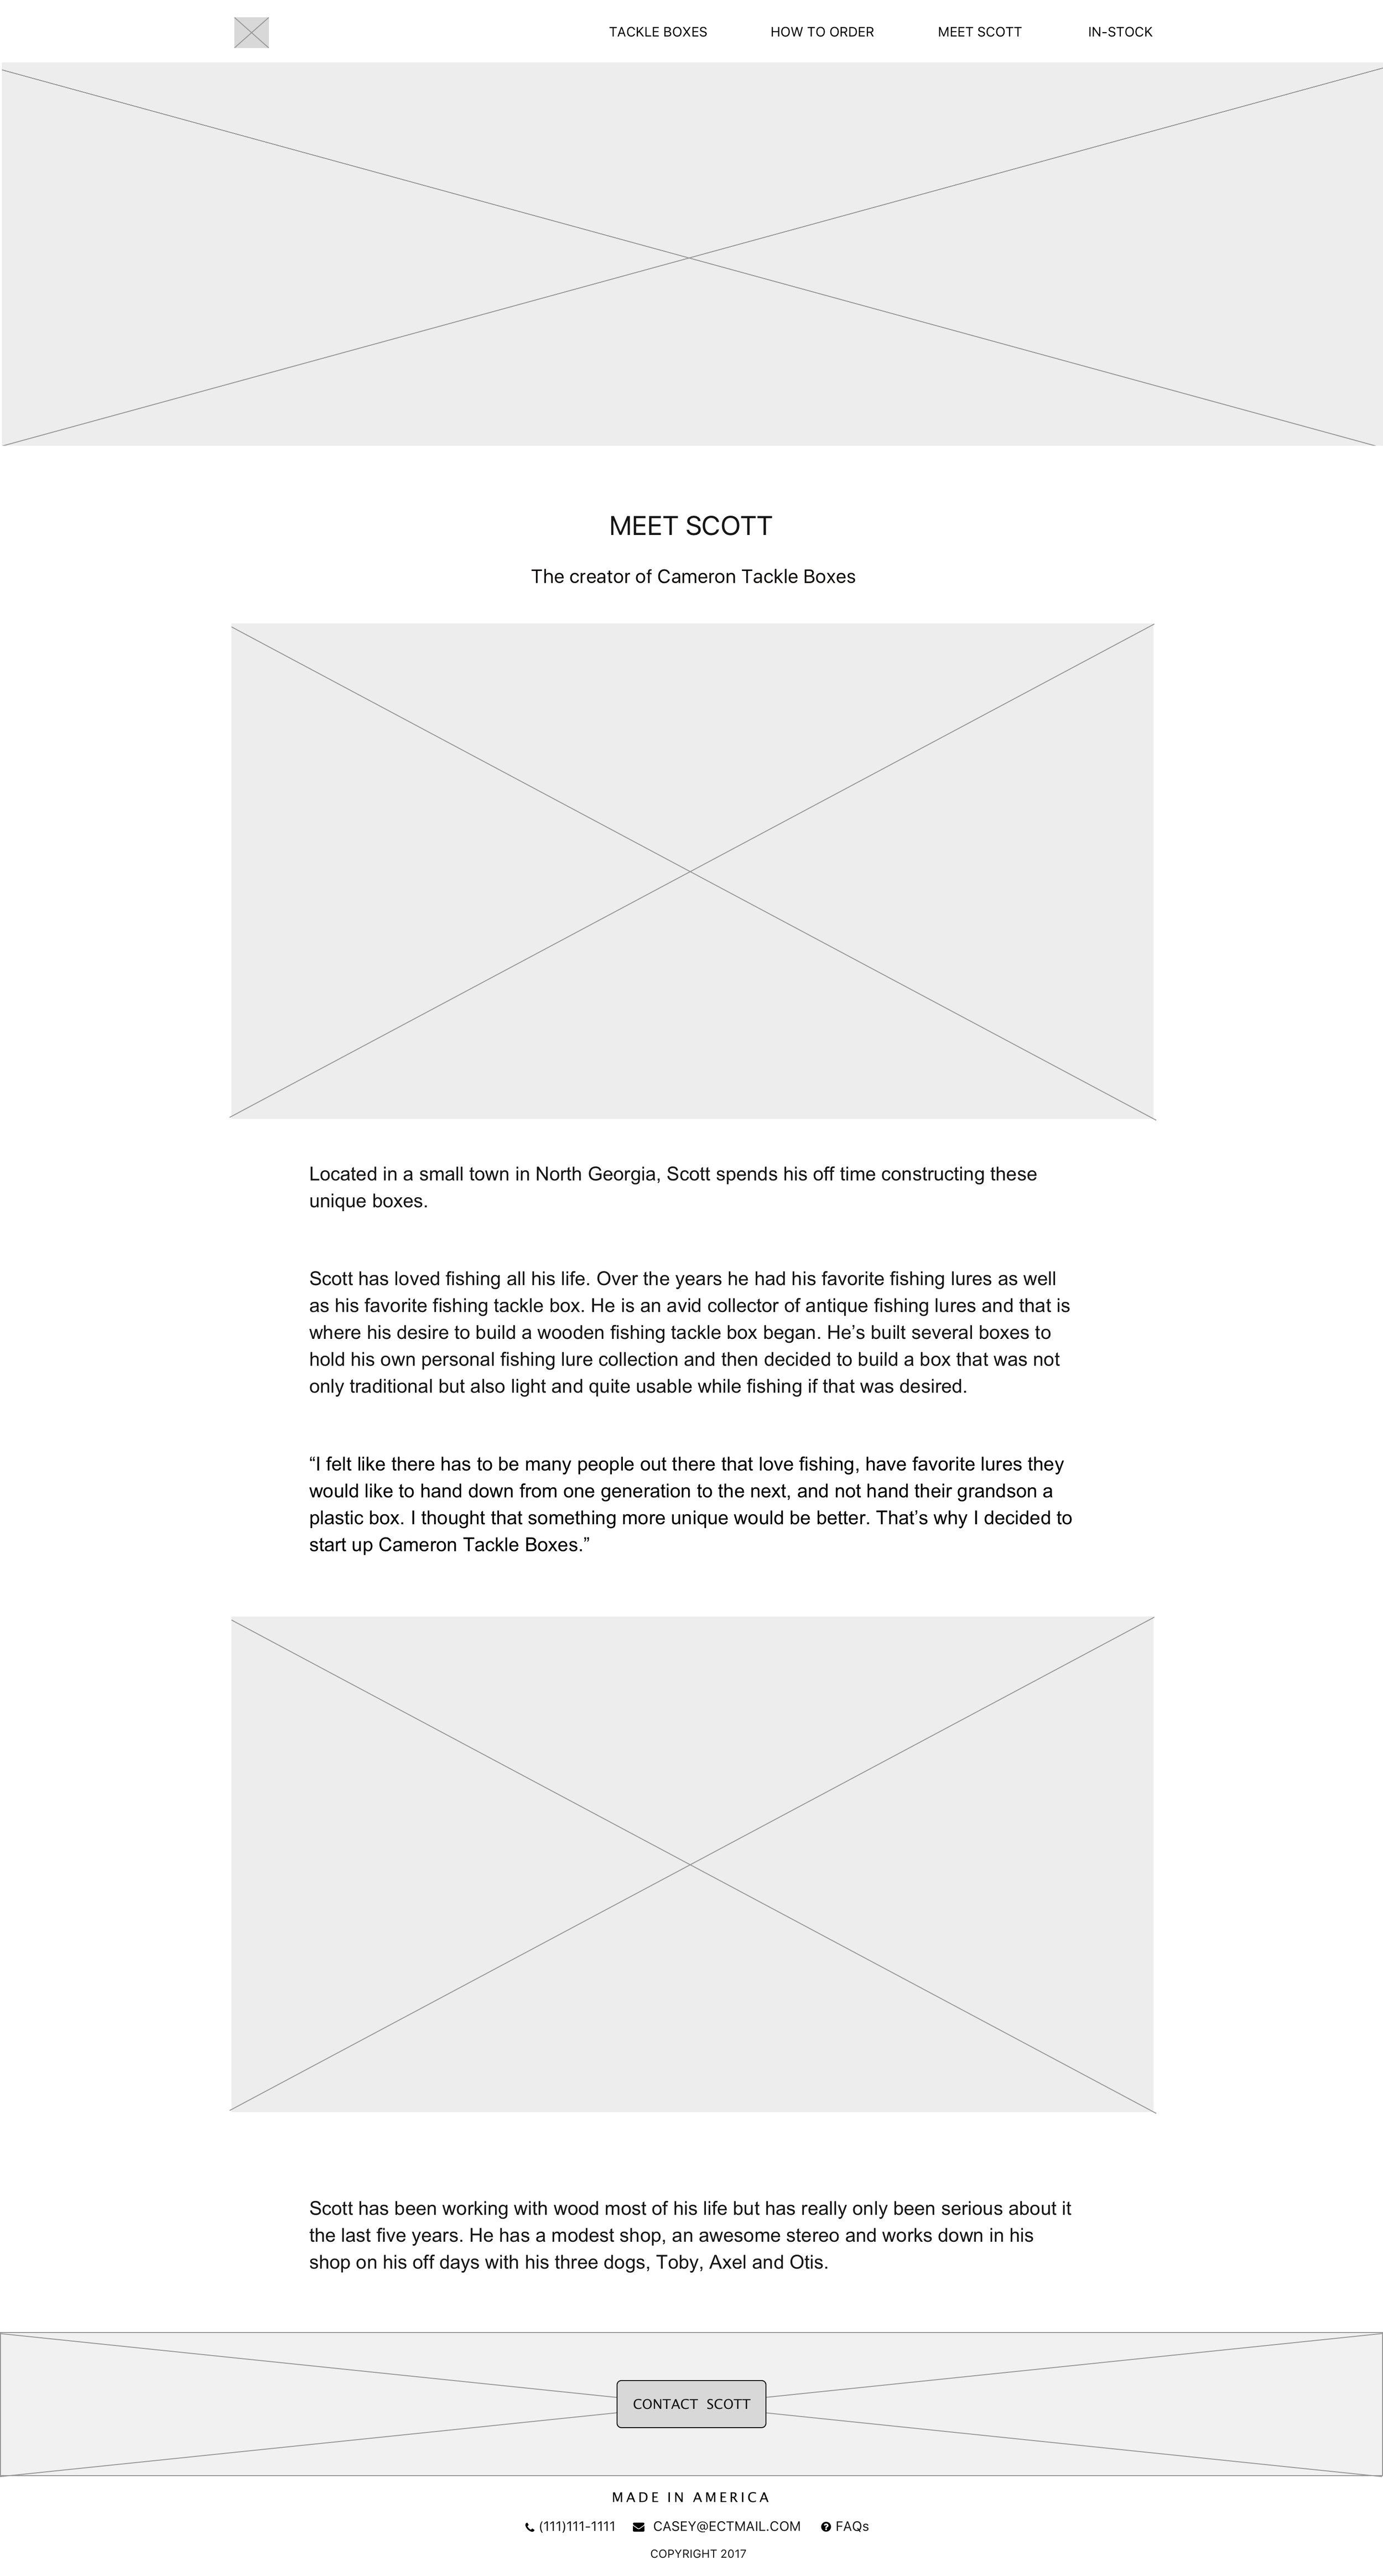 Desktop-Tackle Boxes-2 Copy 2.jpg